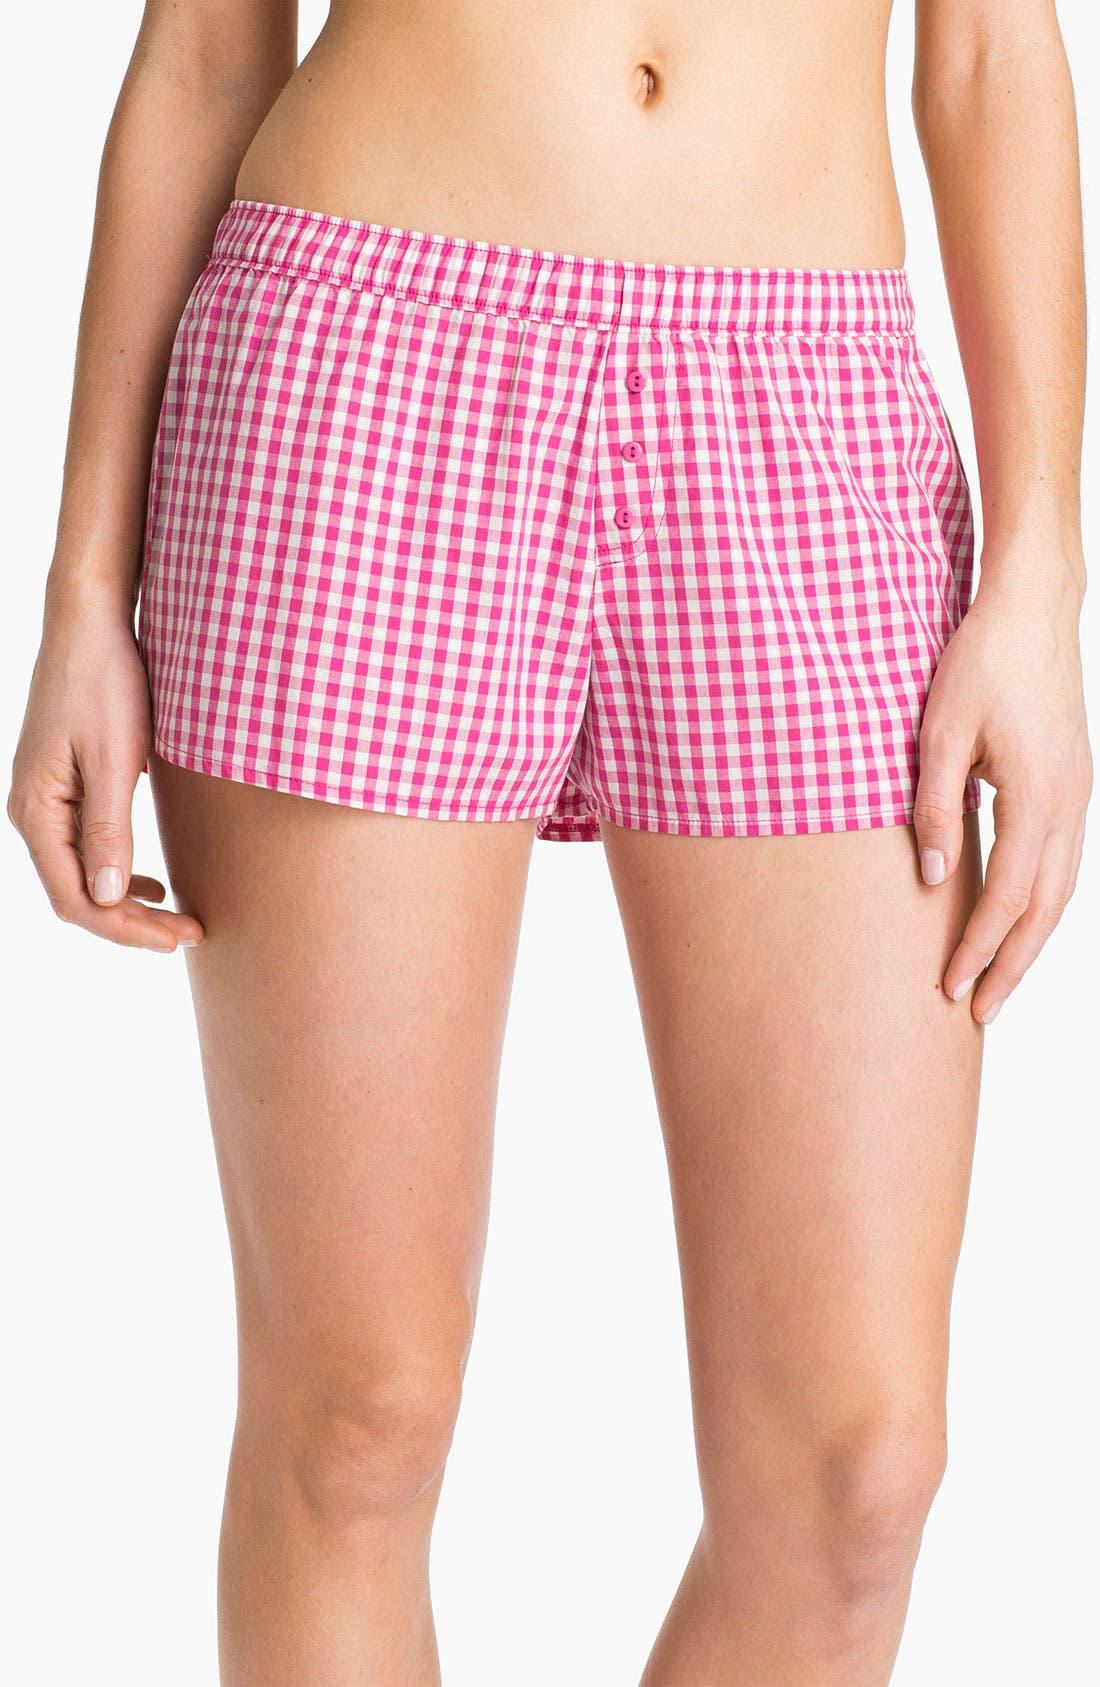 Alternate Image 1 Selected - Make + Model 'Short but Sweet' Lounge Shorts